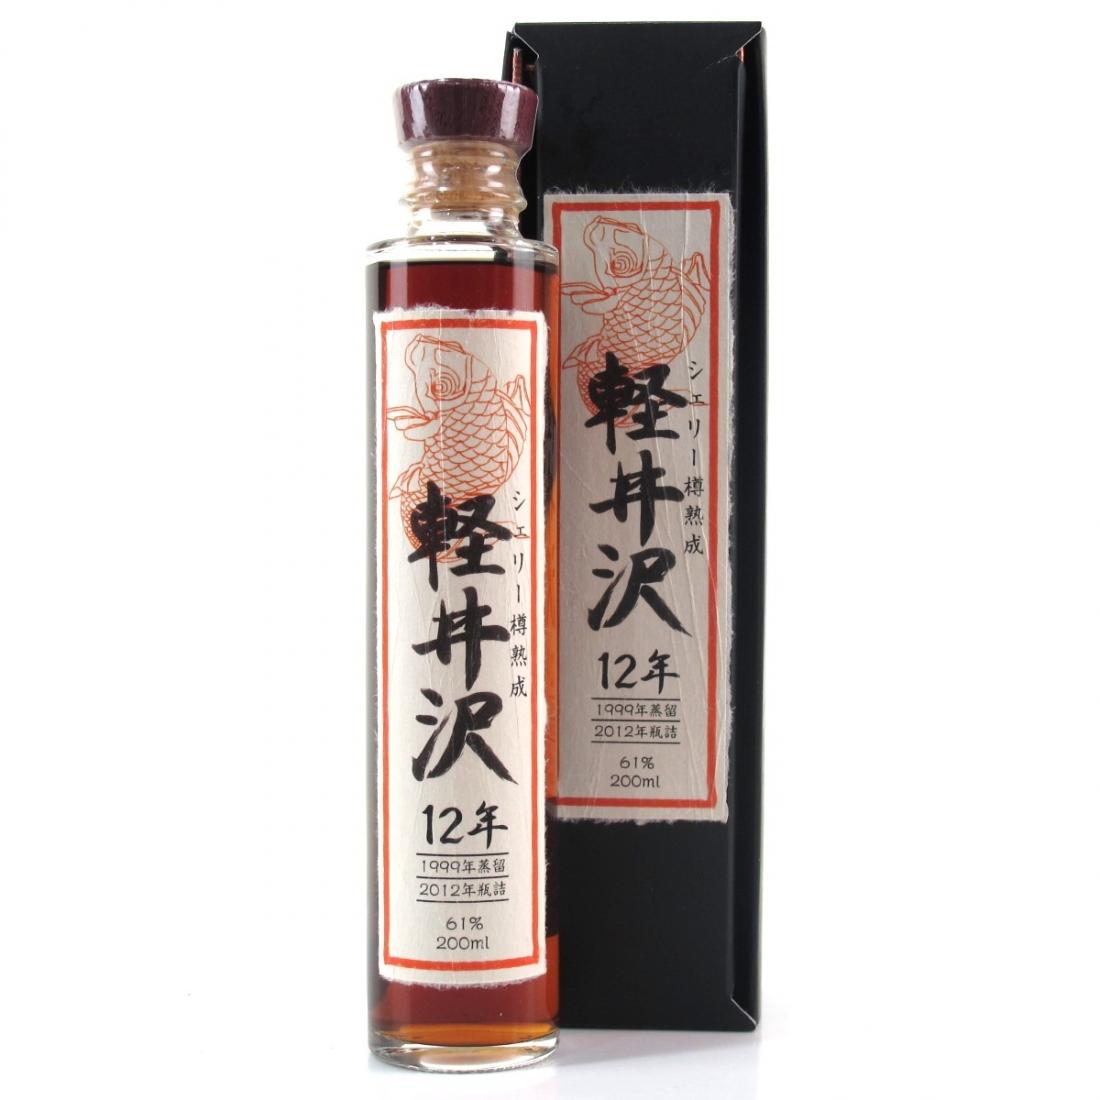 Karuizawa 1999 Isetan 12 Year Old 1st Release 20cl